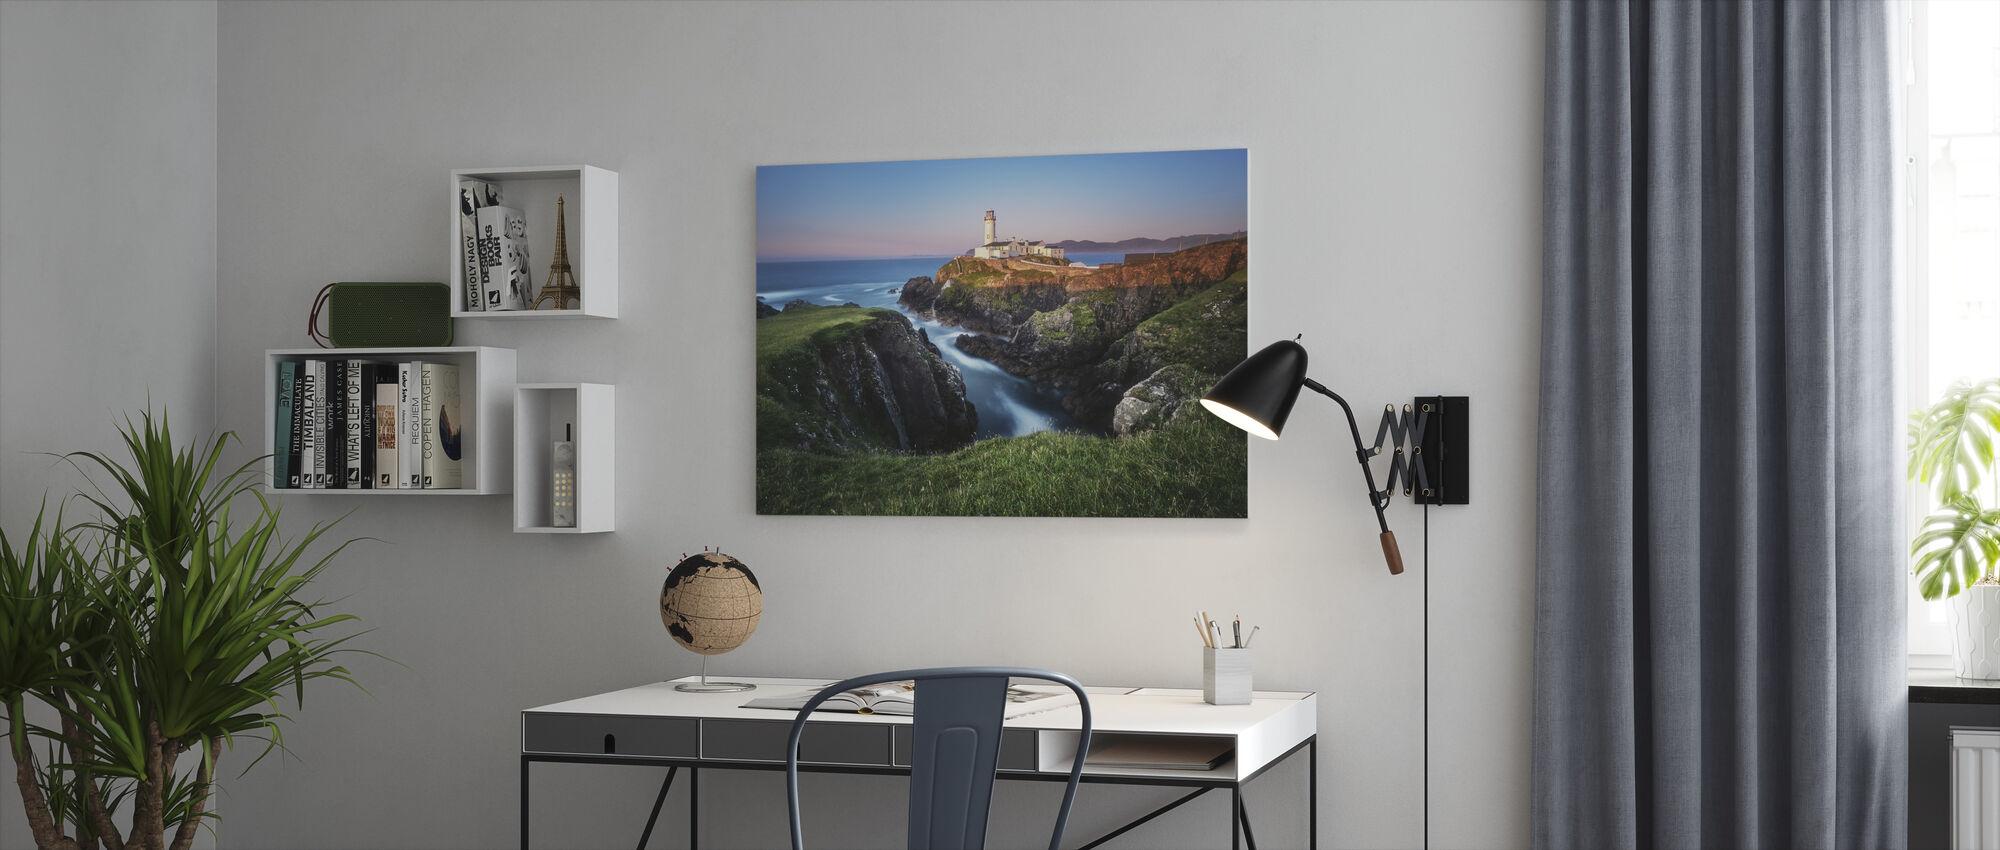 Ireland Fanad Head Lighthouse - Canvas print - Office